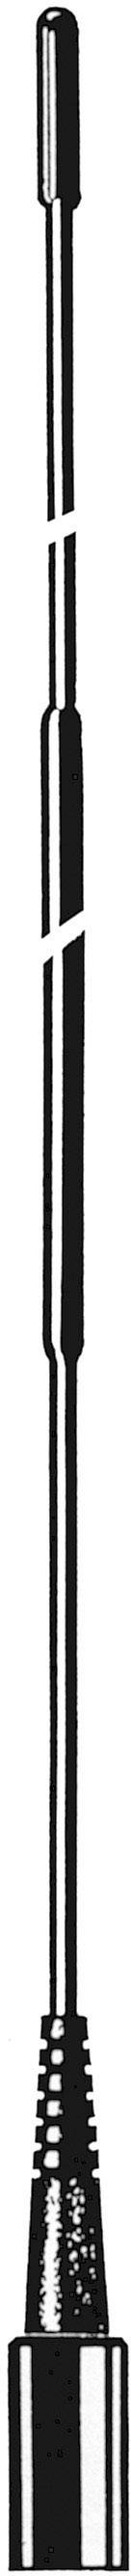 Albrecht 6577 Hyflex CL 27 BNC, Druh lambda sondy 1/4